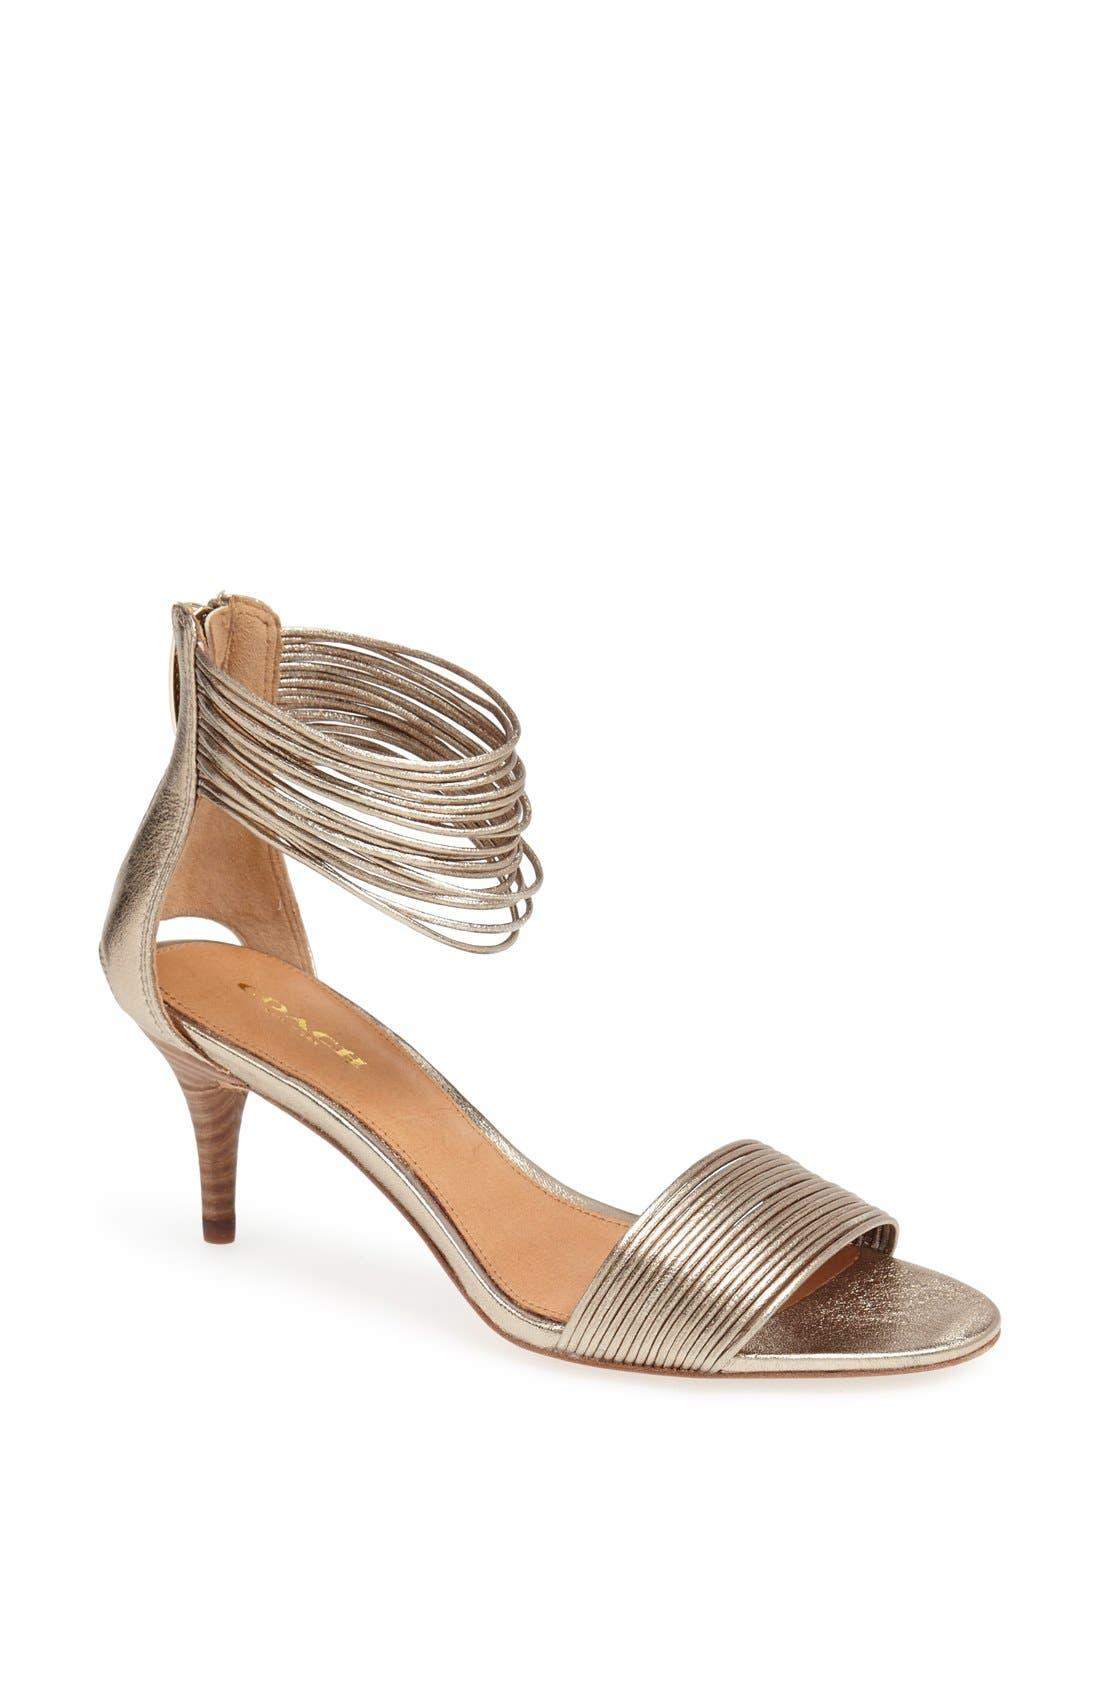 Main Image - COACH 'Manya' Sandal